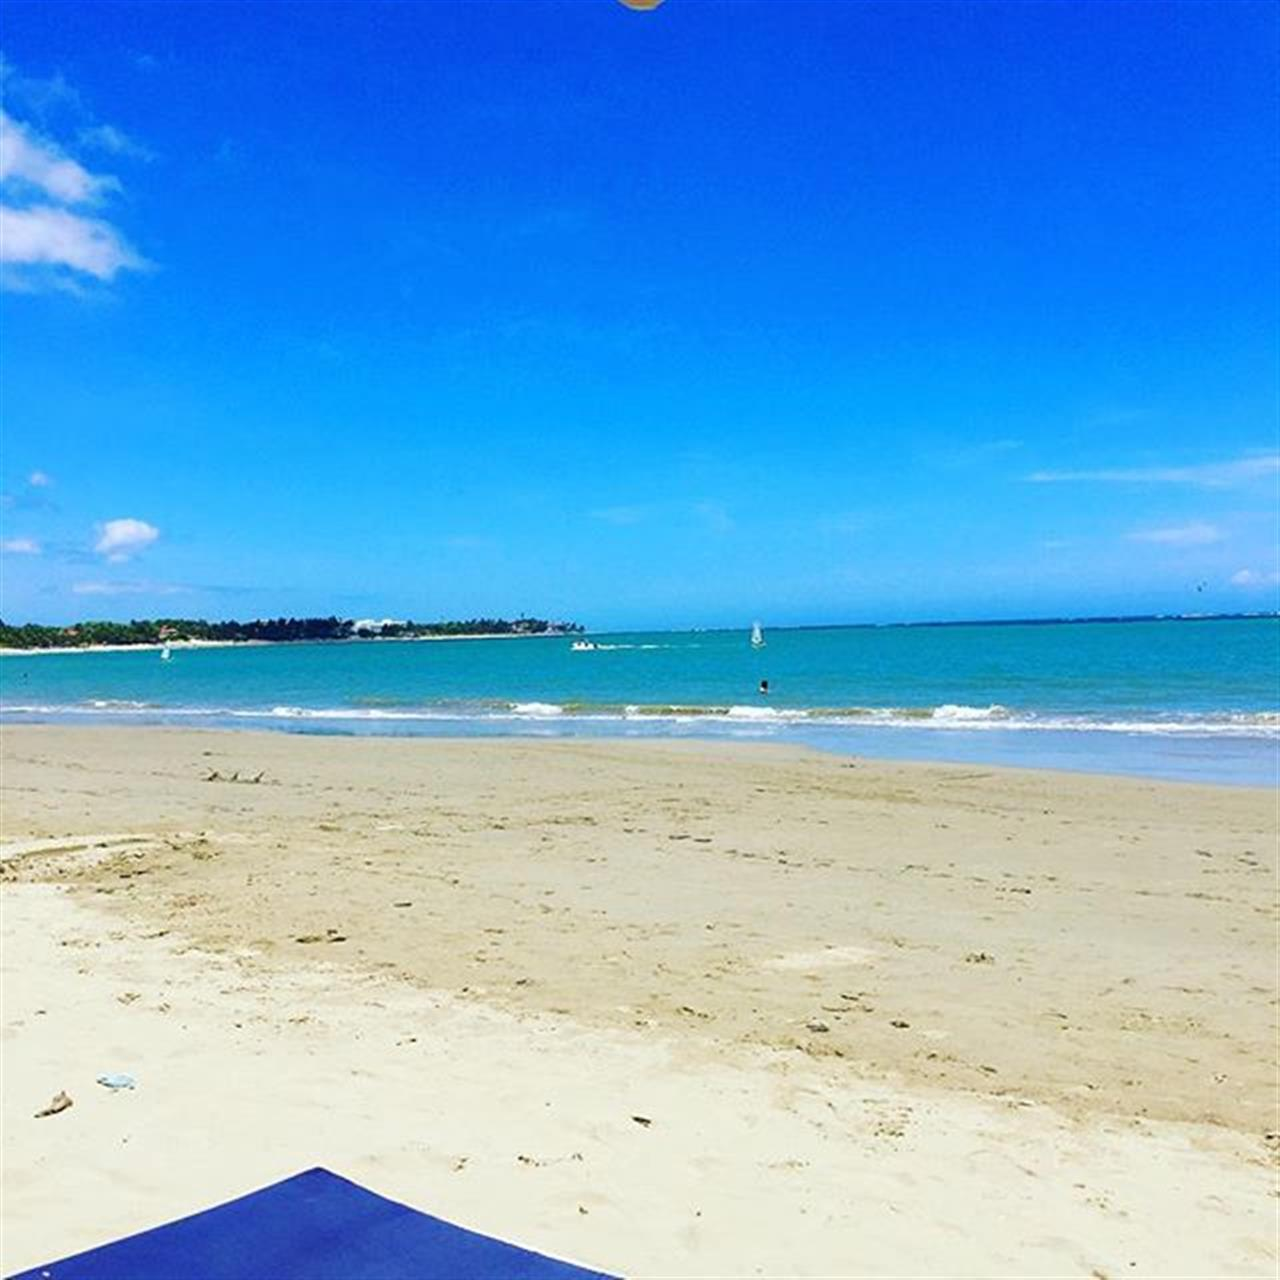 Happy Saturday! Location: #Cabarete #DominicanRepublic